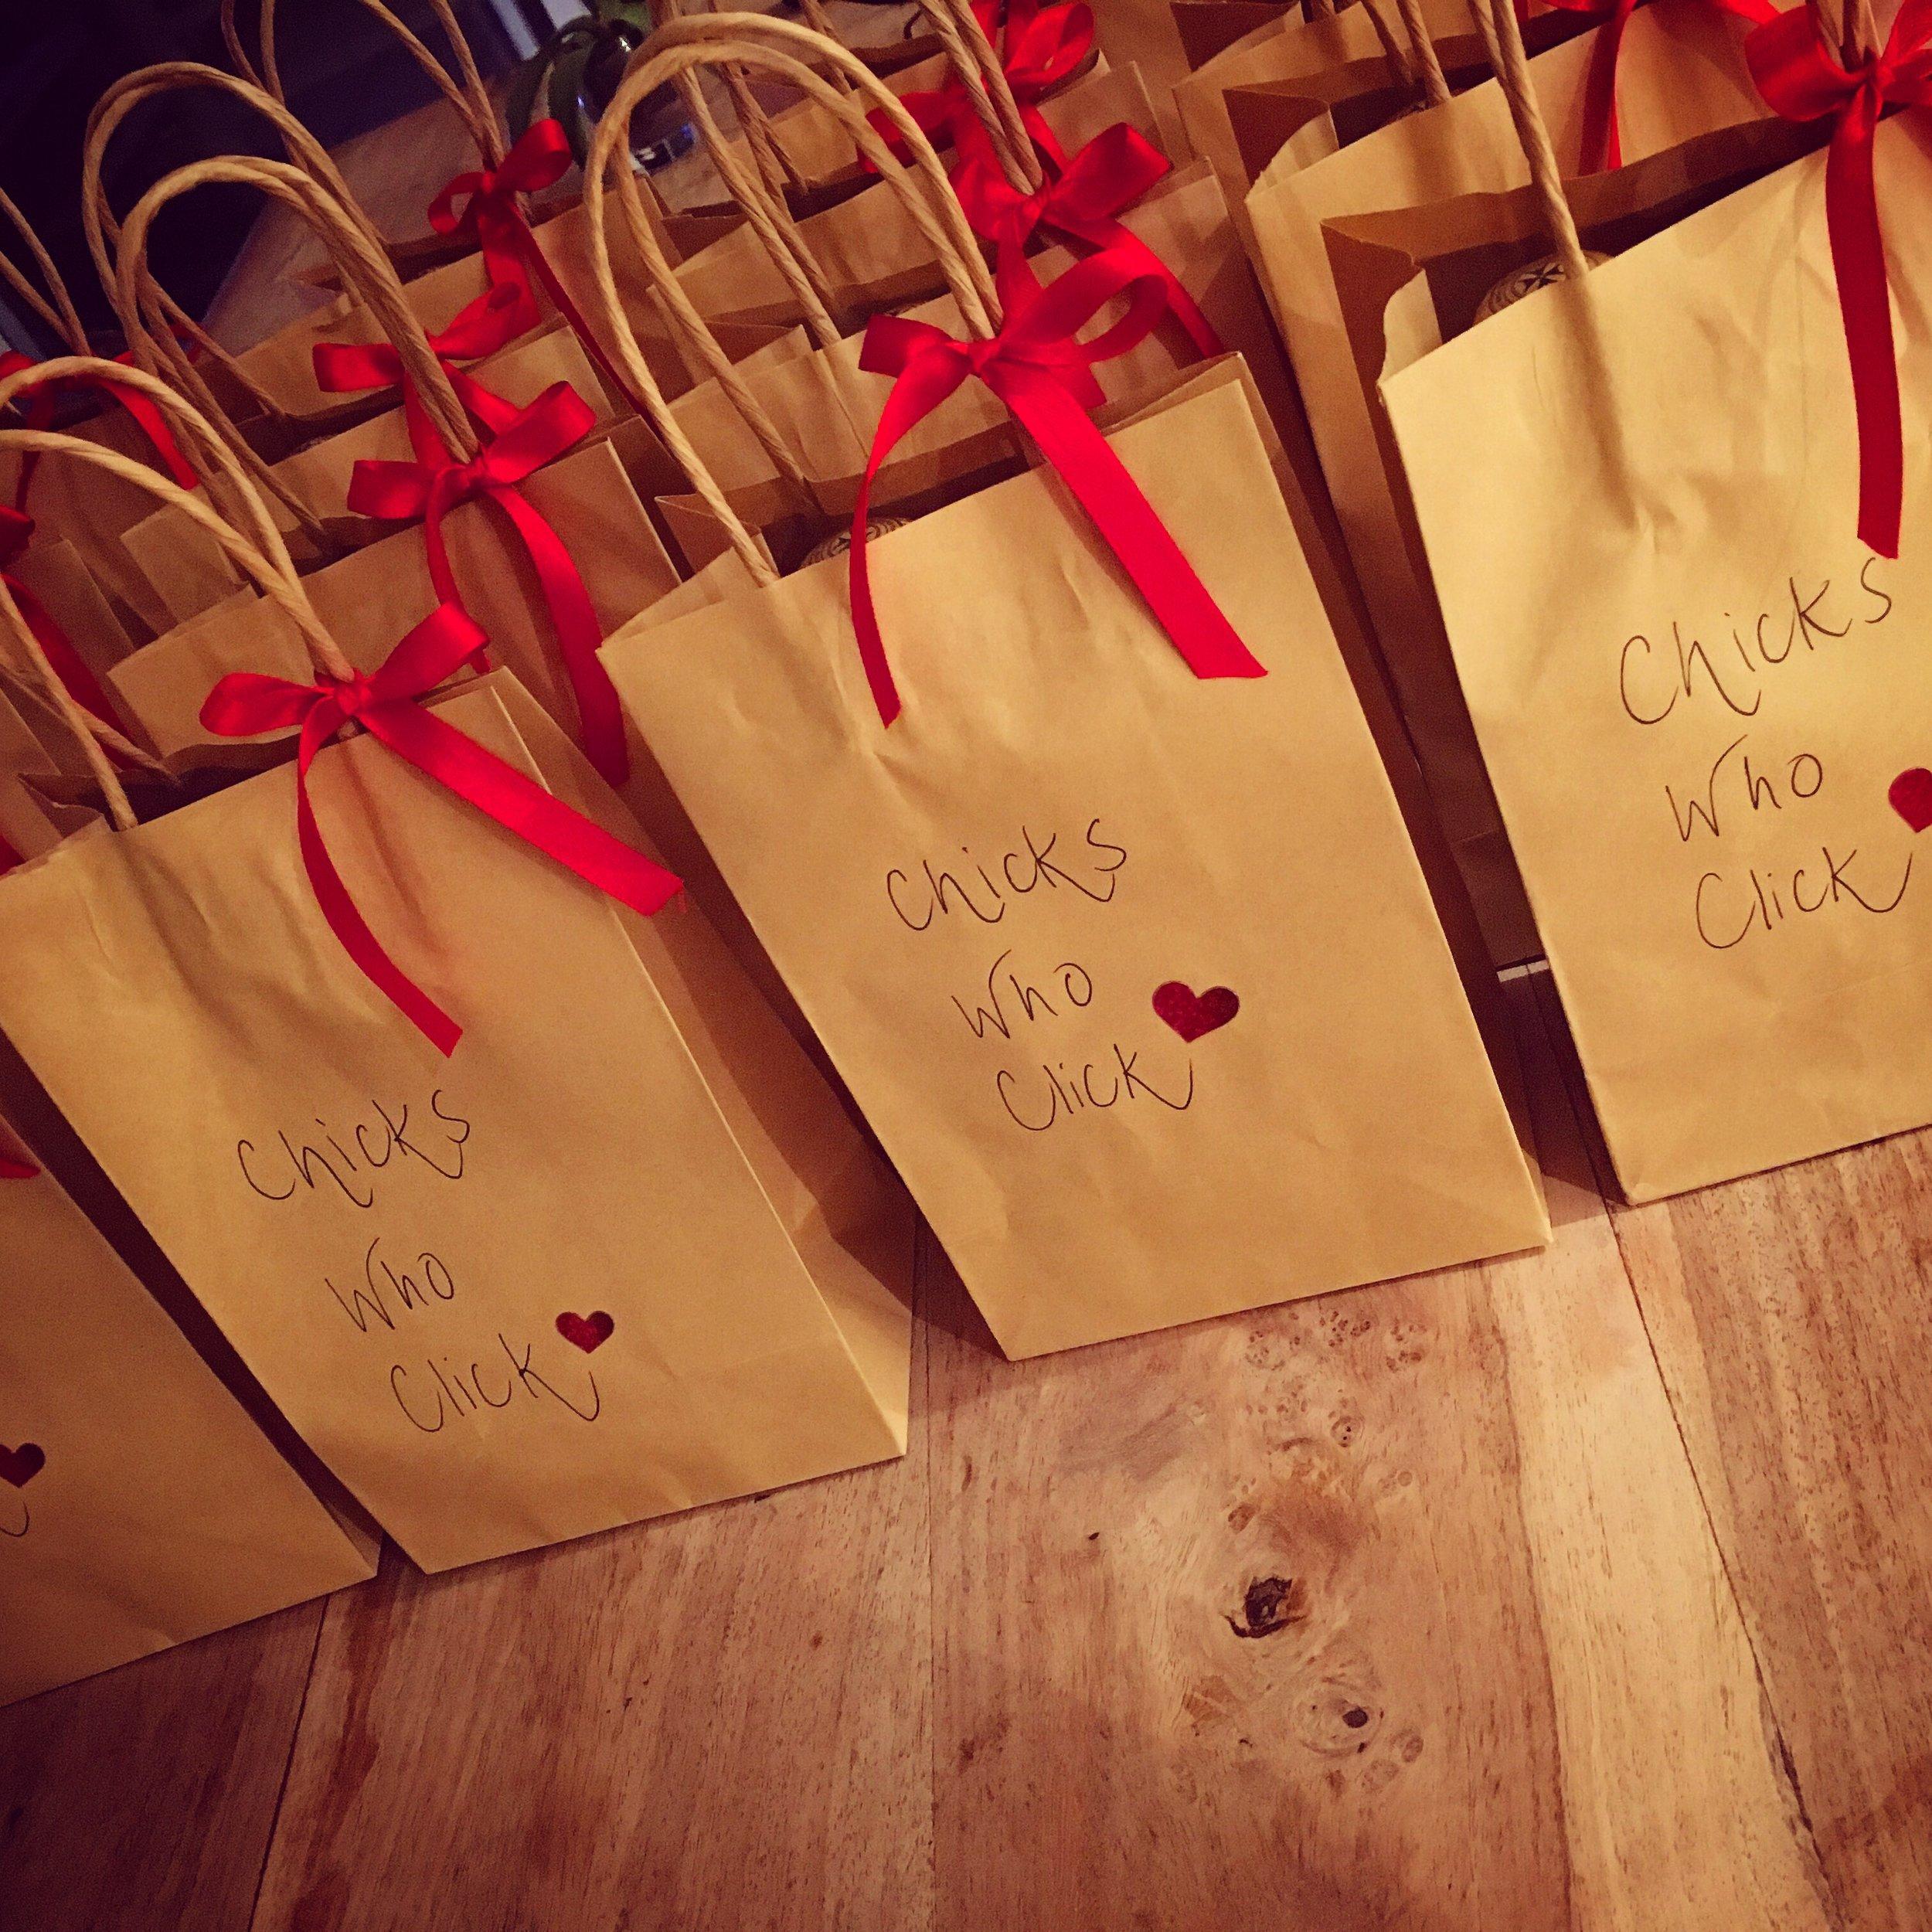 We love gifting